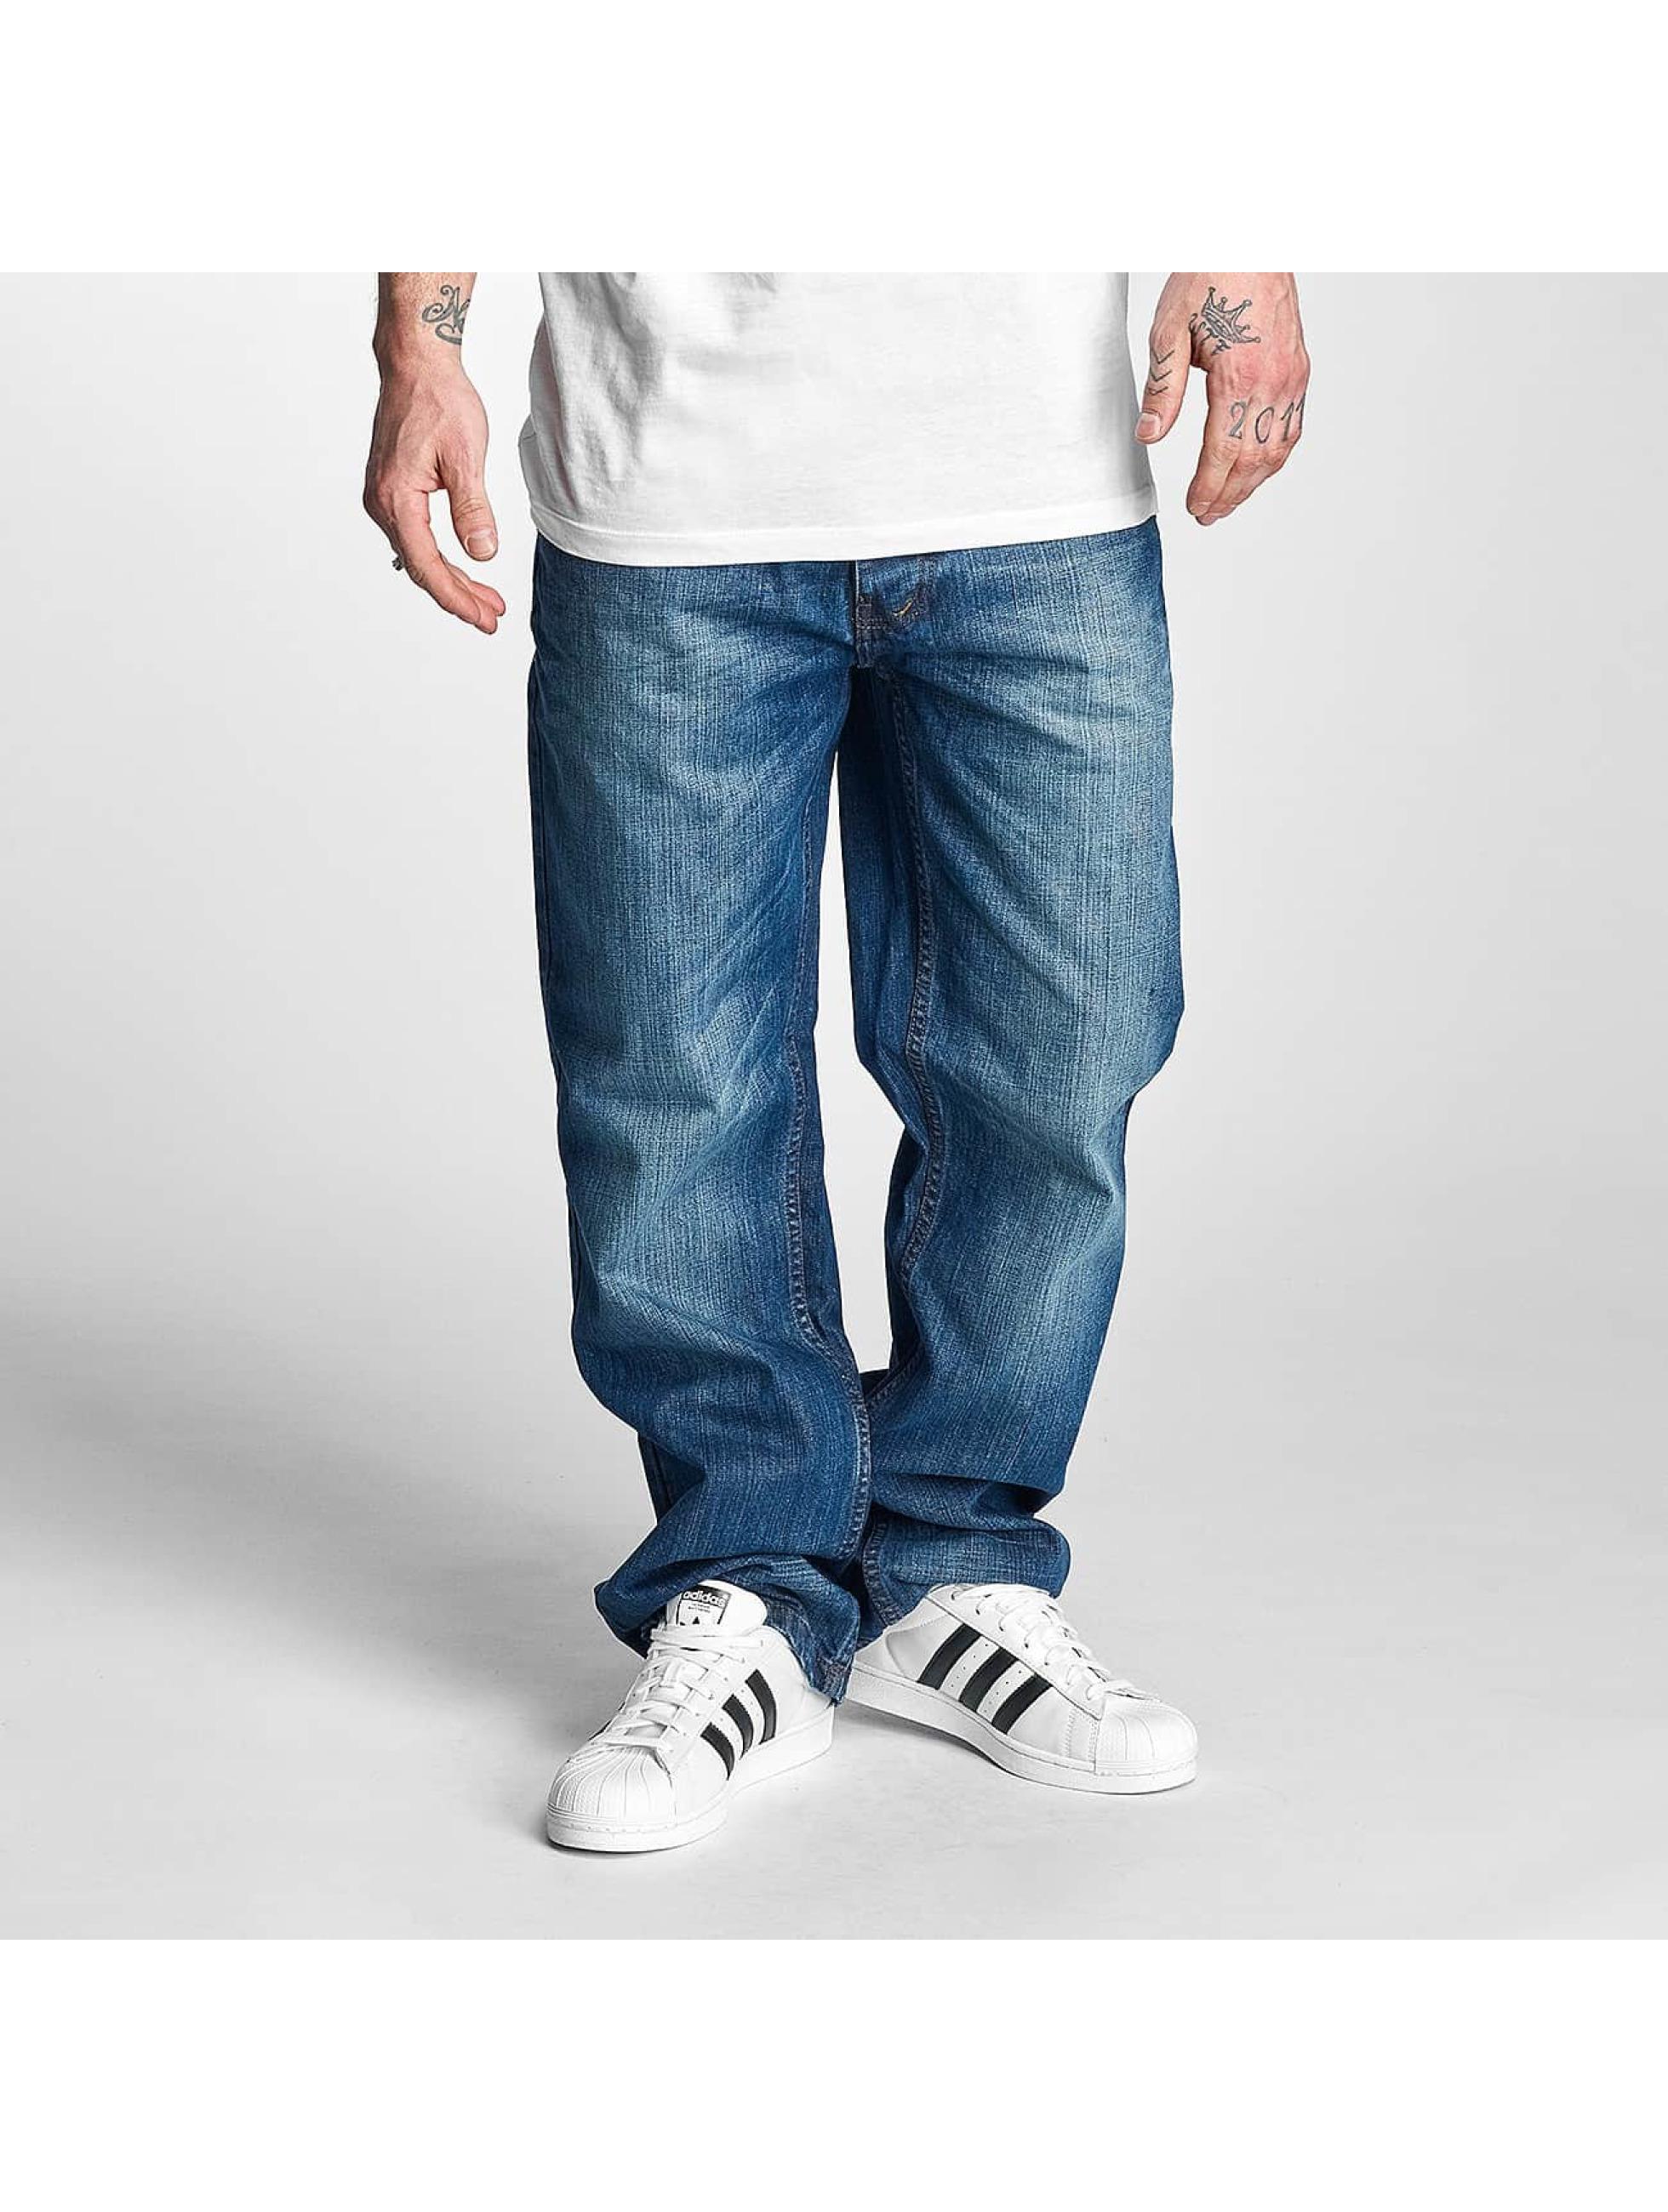 Rocawear / Loose Fit Jeans Loose in blue W 44